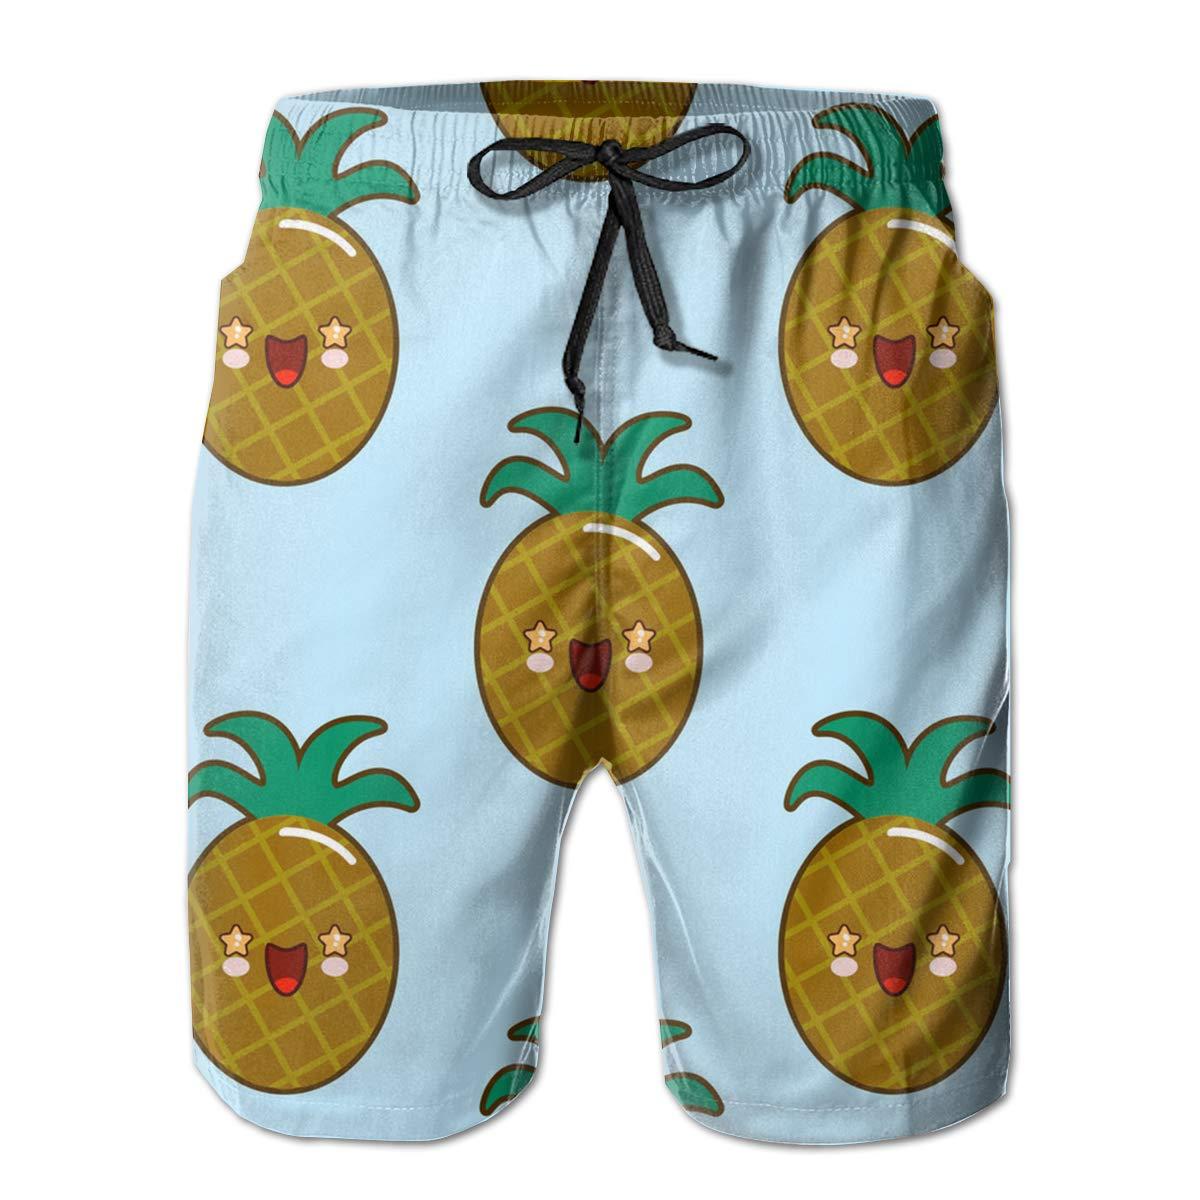 SARA NELL Mens Swim Trunks Cute Smiling Pineapples Emoji Surfing Beach Board Shorts Swimwear